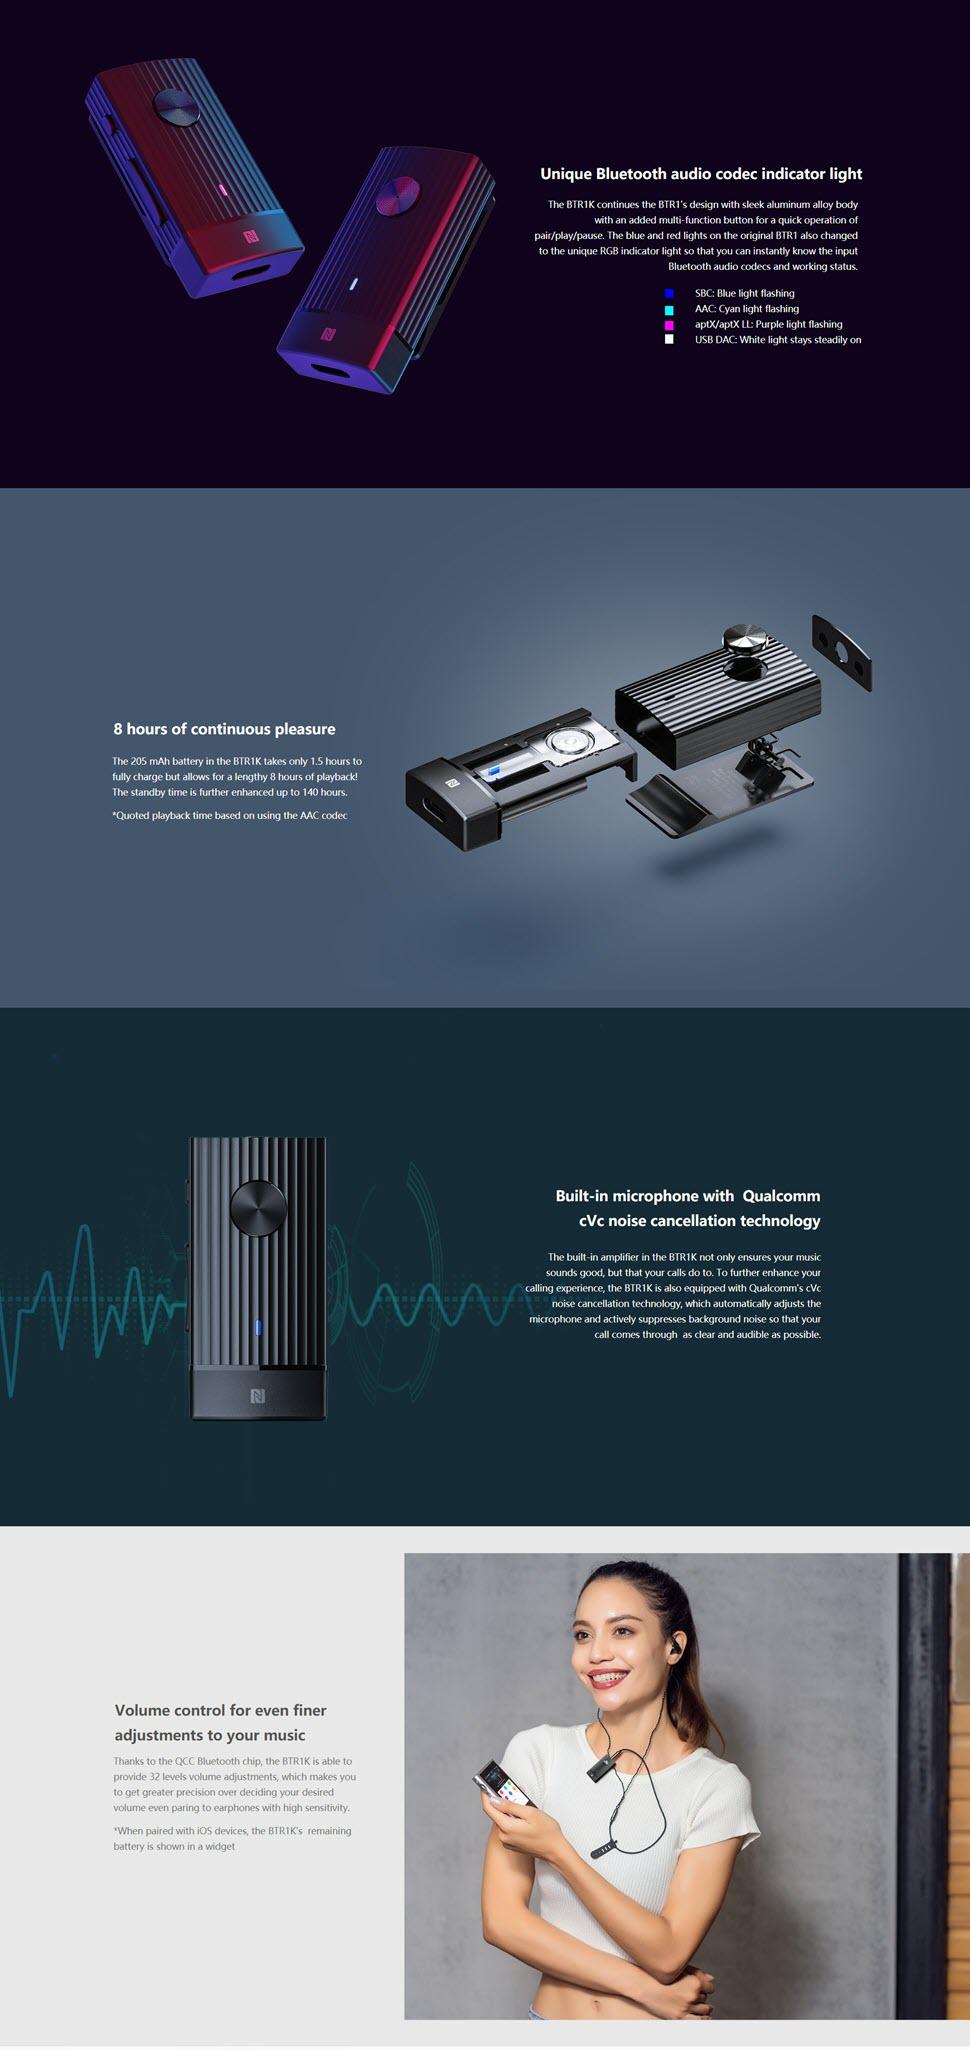 Fiio High Fidelity Bluetooth Amp Btr1k (2)